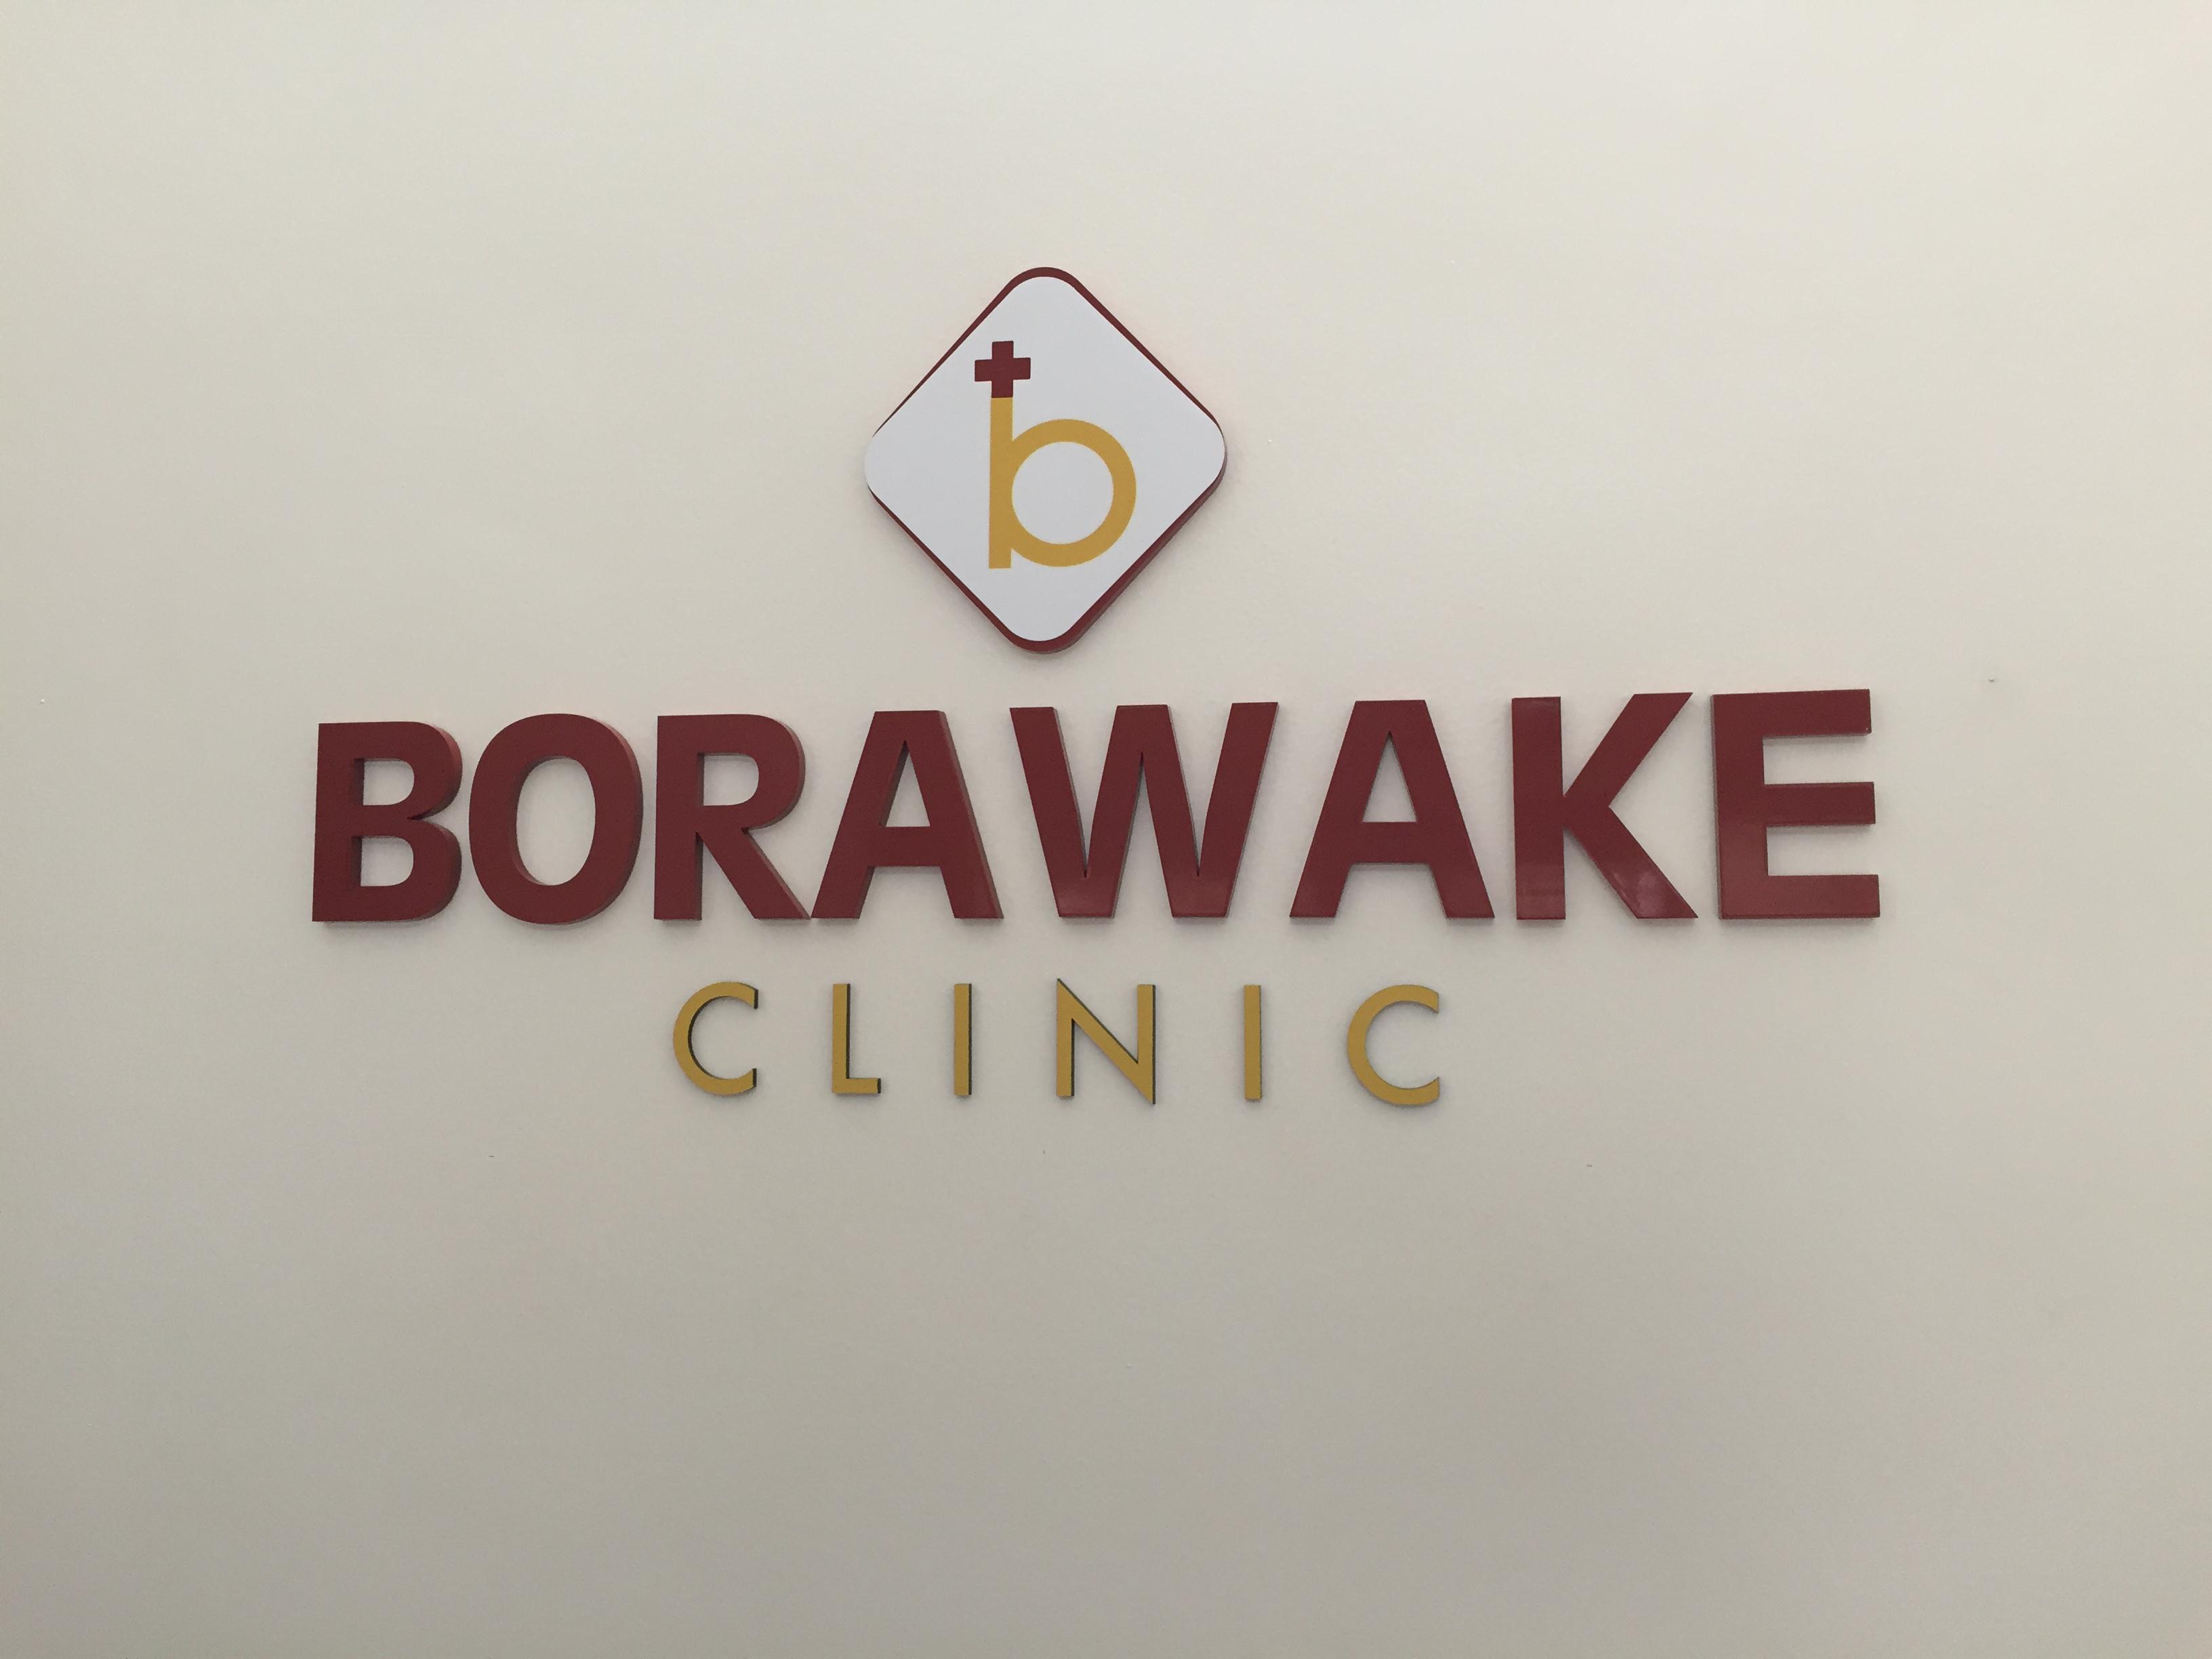 Borawake Clinic